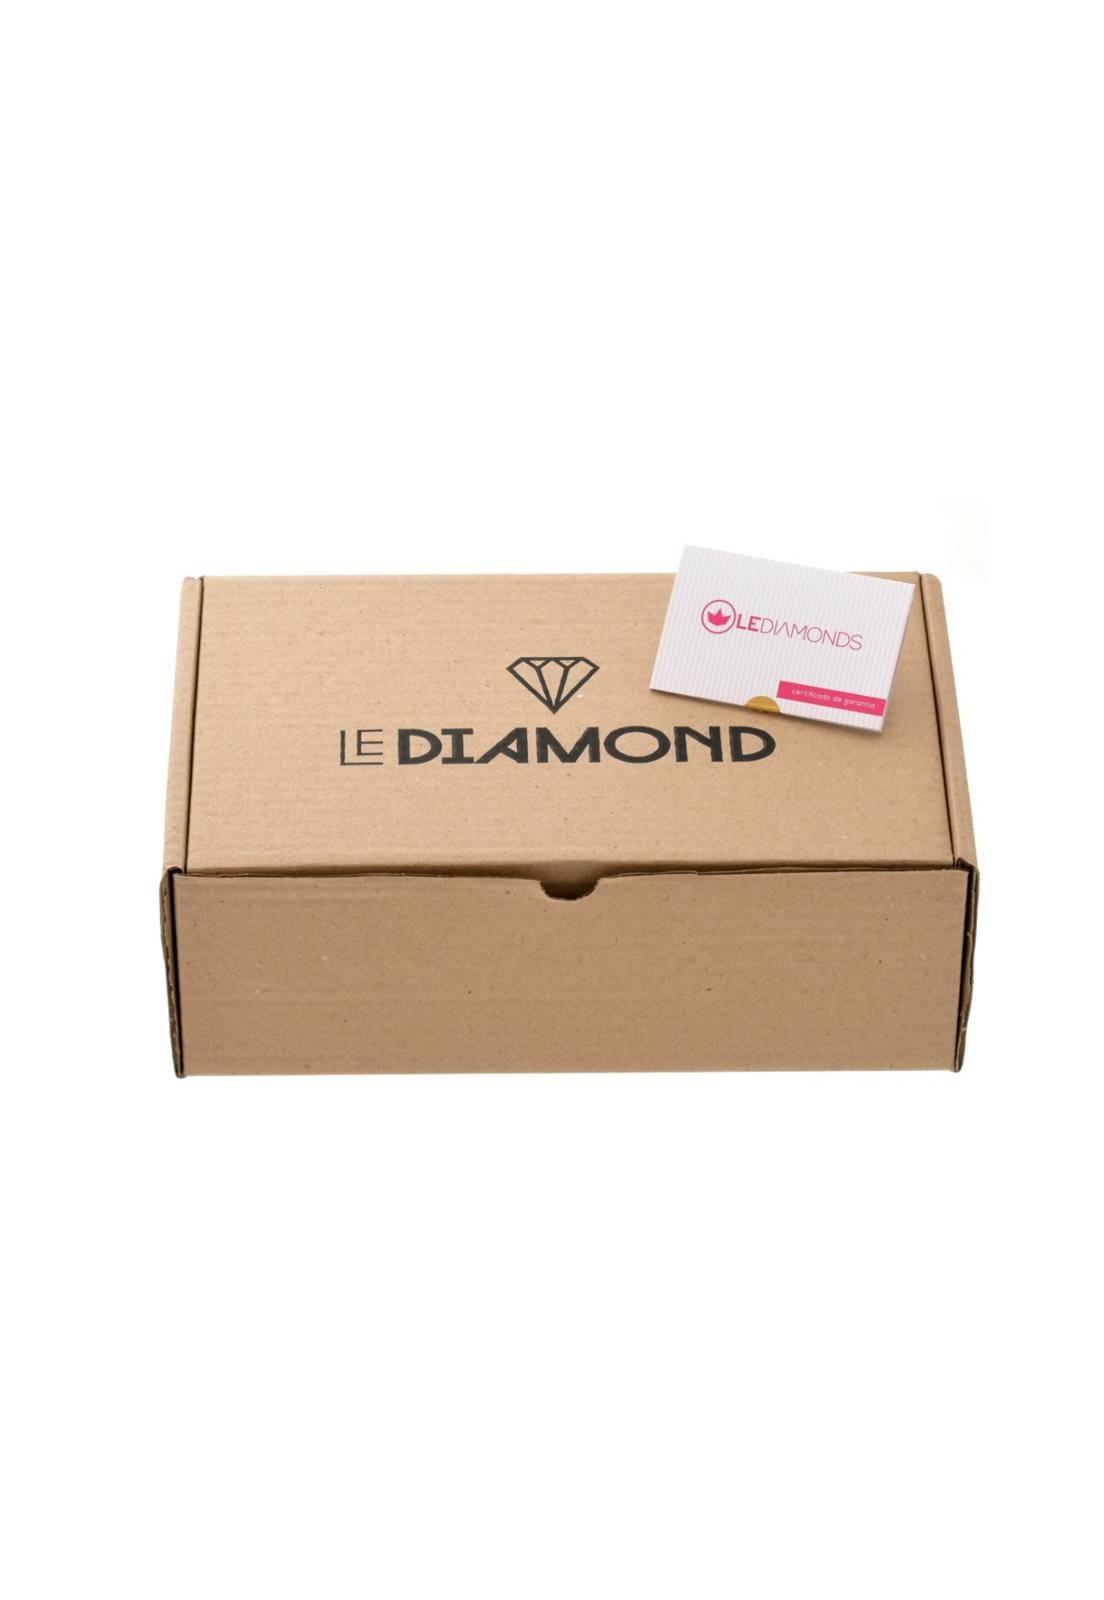 Brinco Le Diamond Chapa com Losango Marmorizado